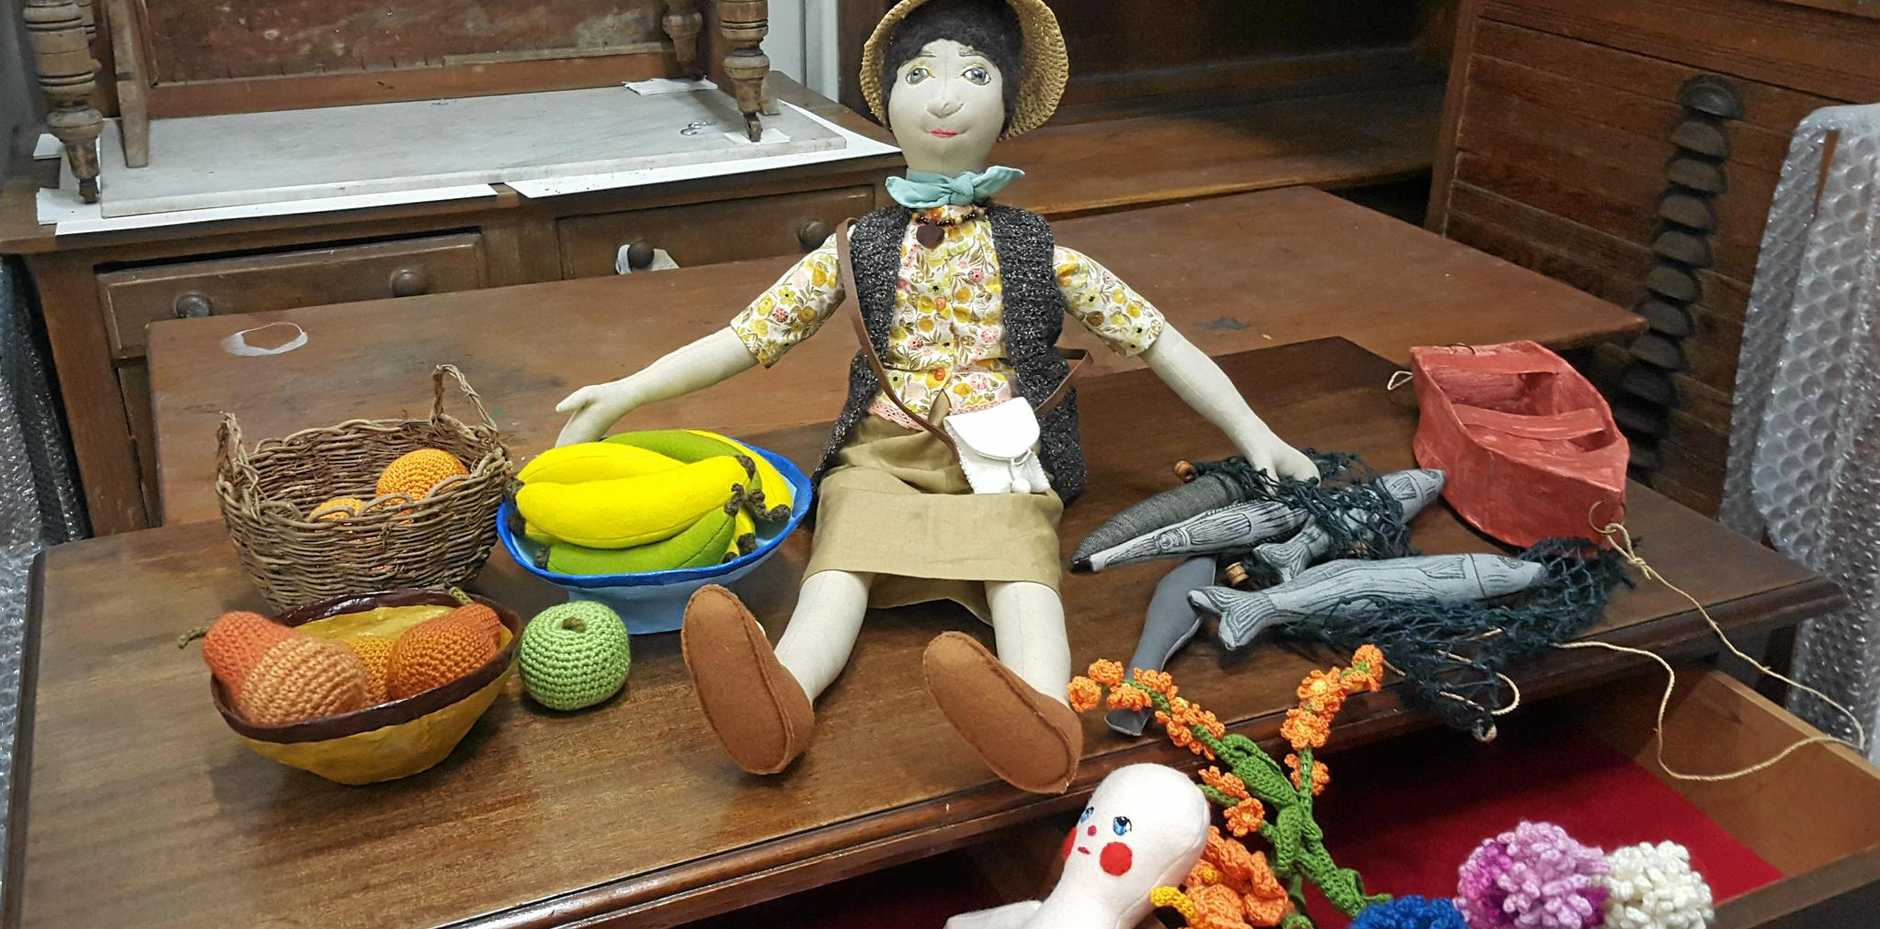 Toys made by Helle Jorgensen.